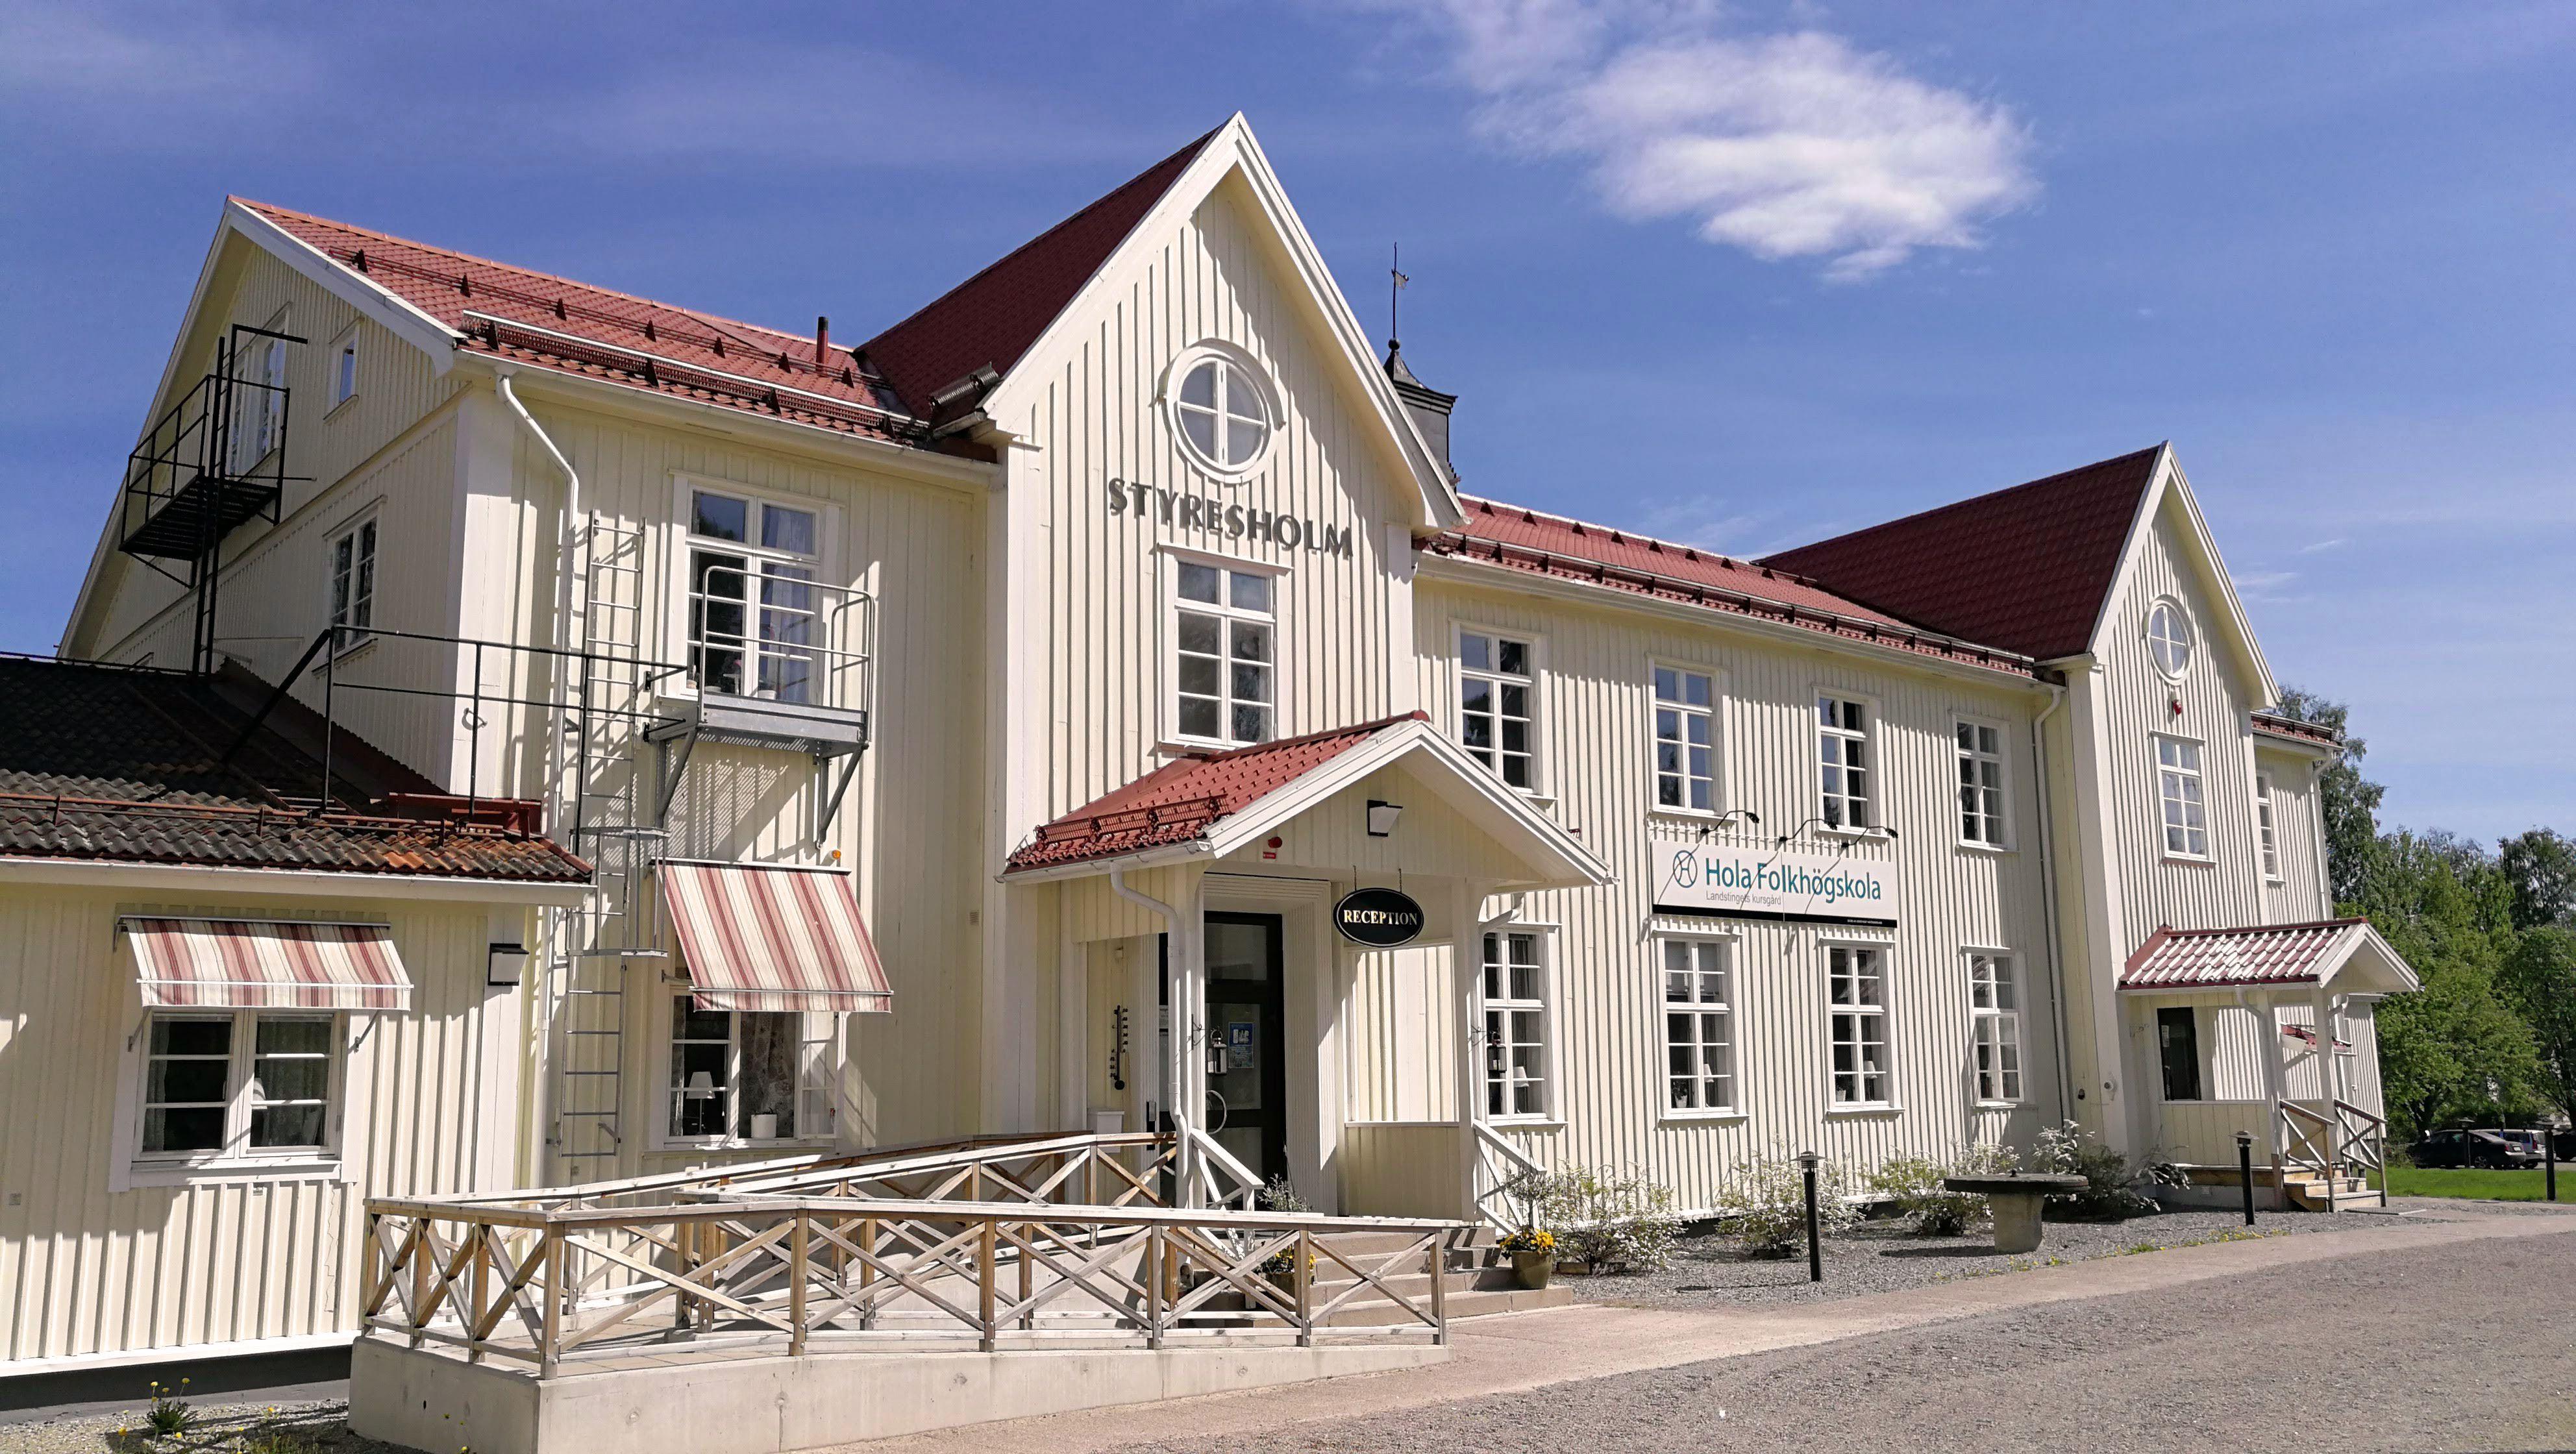 Hans Bergström, Hola Folkhögskola